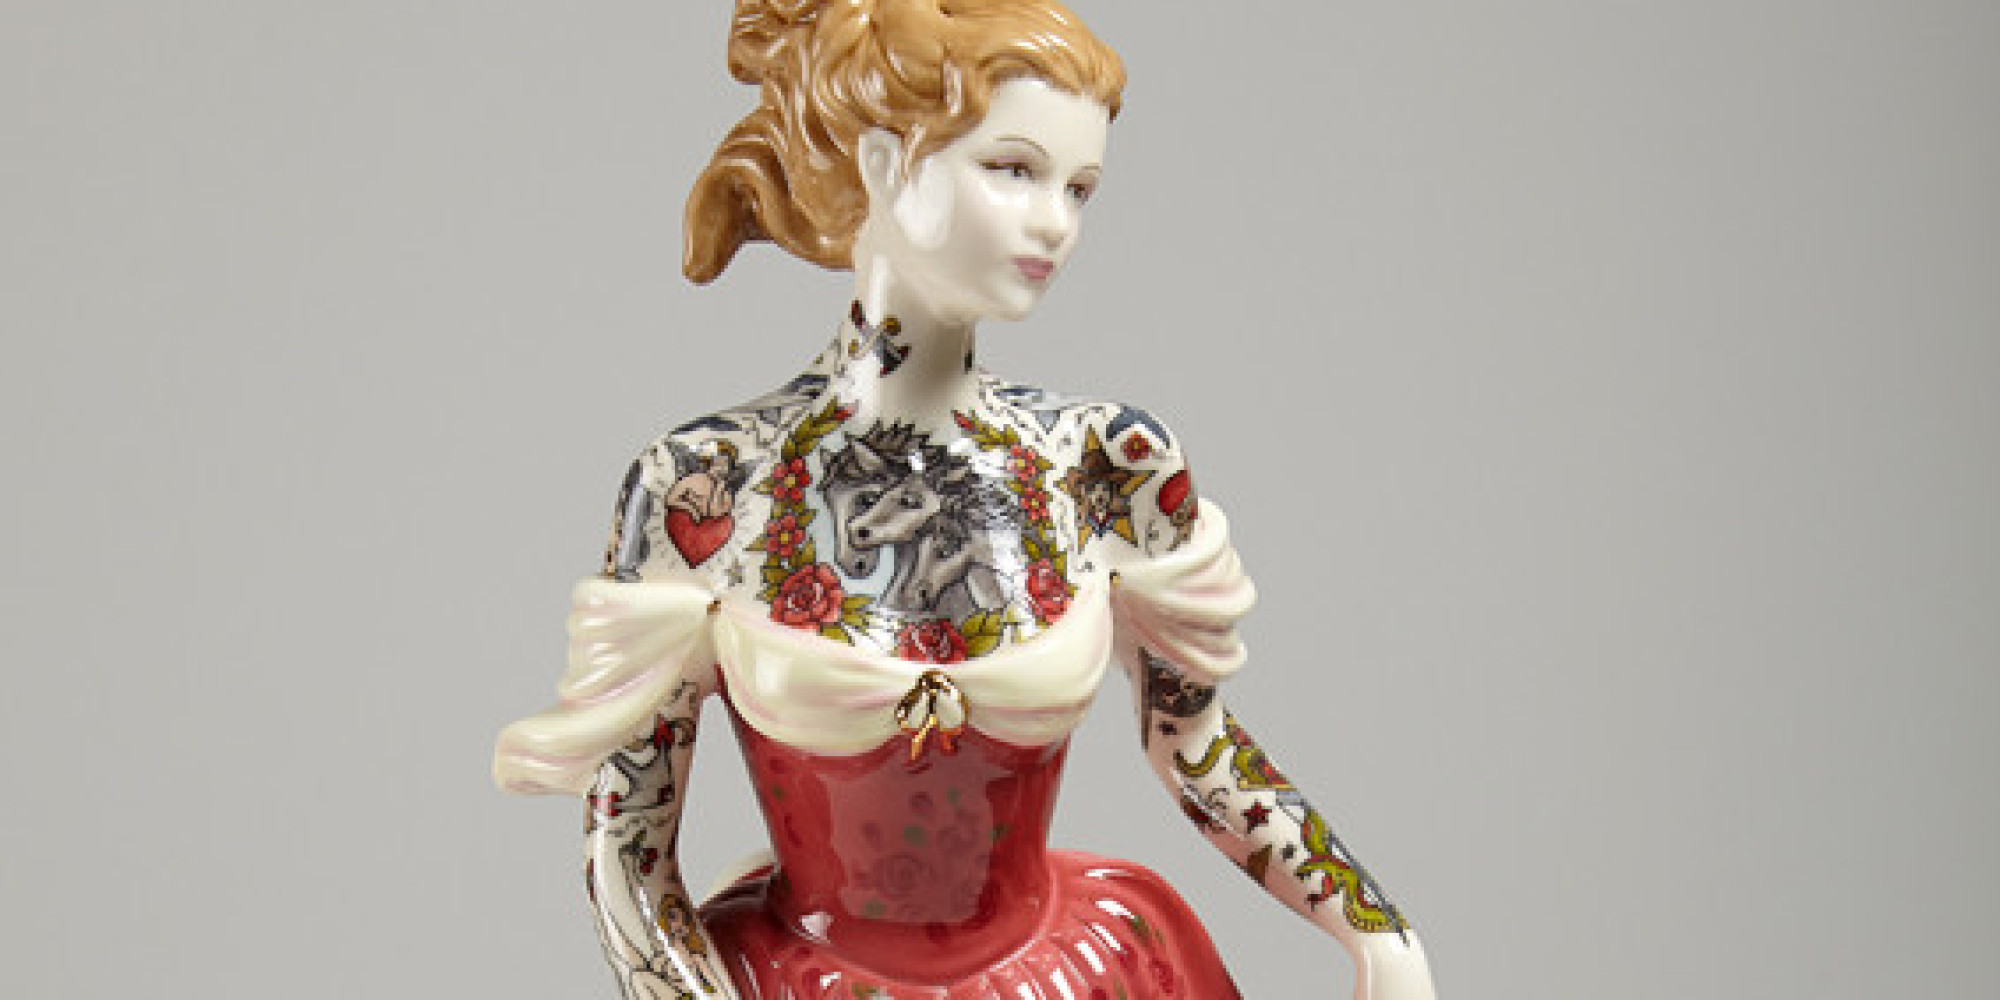 Tattooed Porcelain Dolls Offer An Alternative Way Of